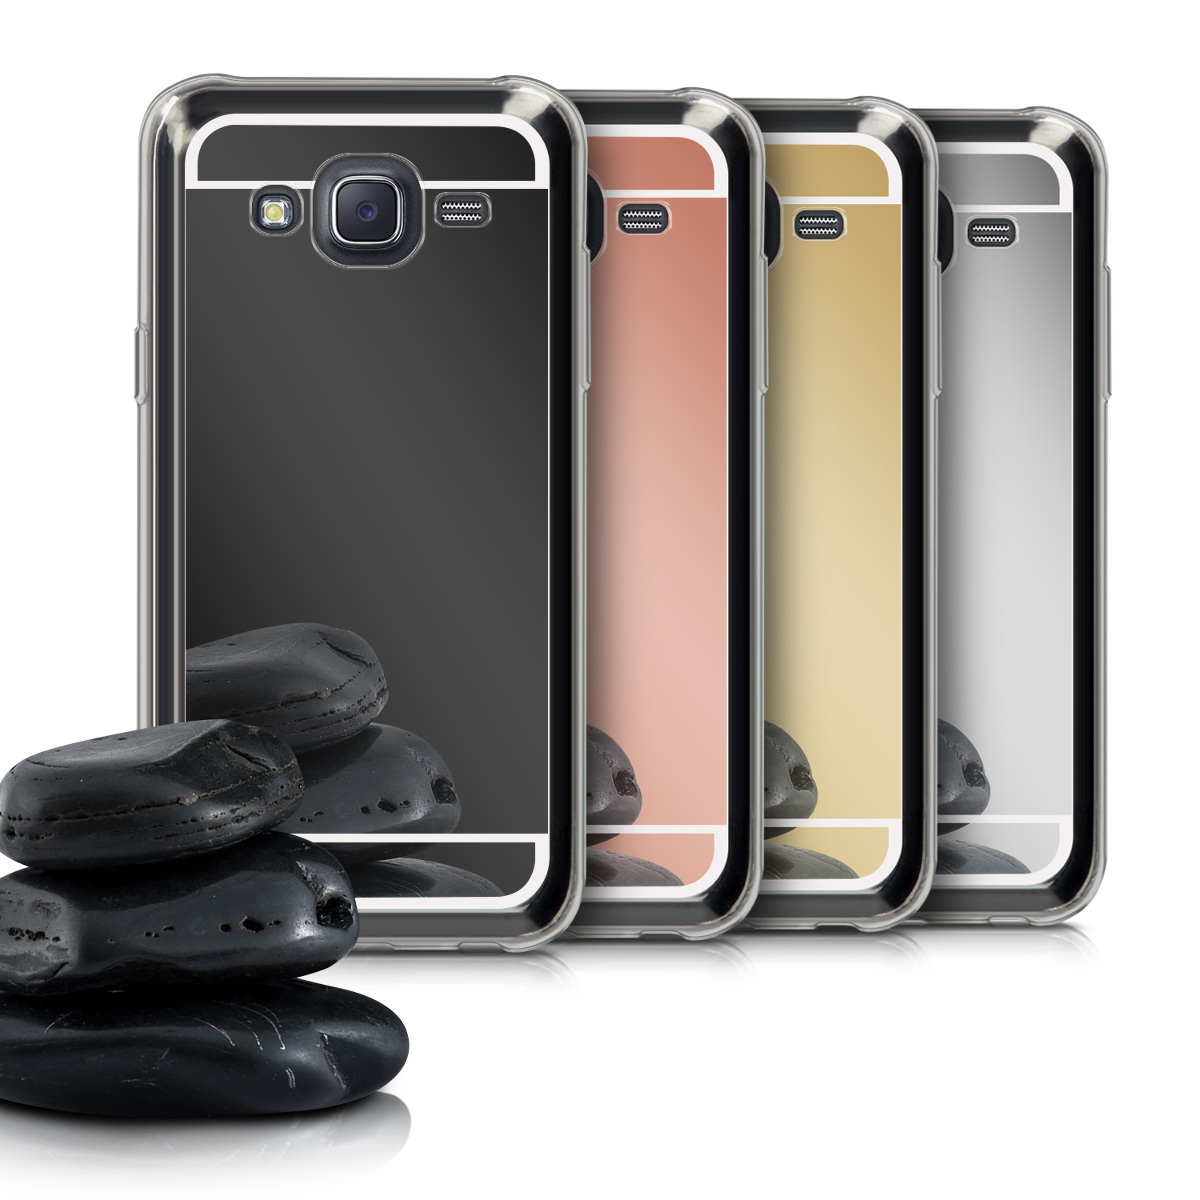 kwmobile Mirror Case for Samsung Galaxy J5 (2015) - TPU Silicone Bumper Protective Cover Reflective Back Case - Desired Color. ‹ › ‹ › ‹ › ‹ ›